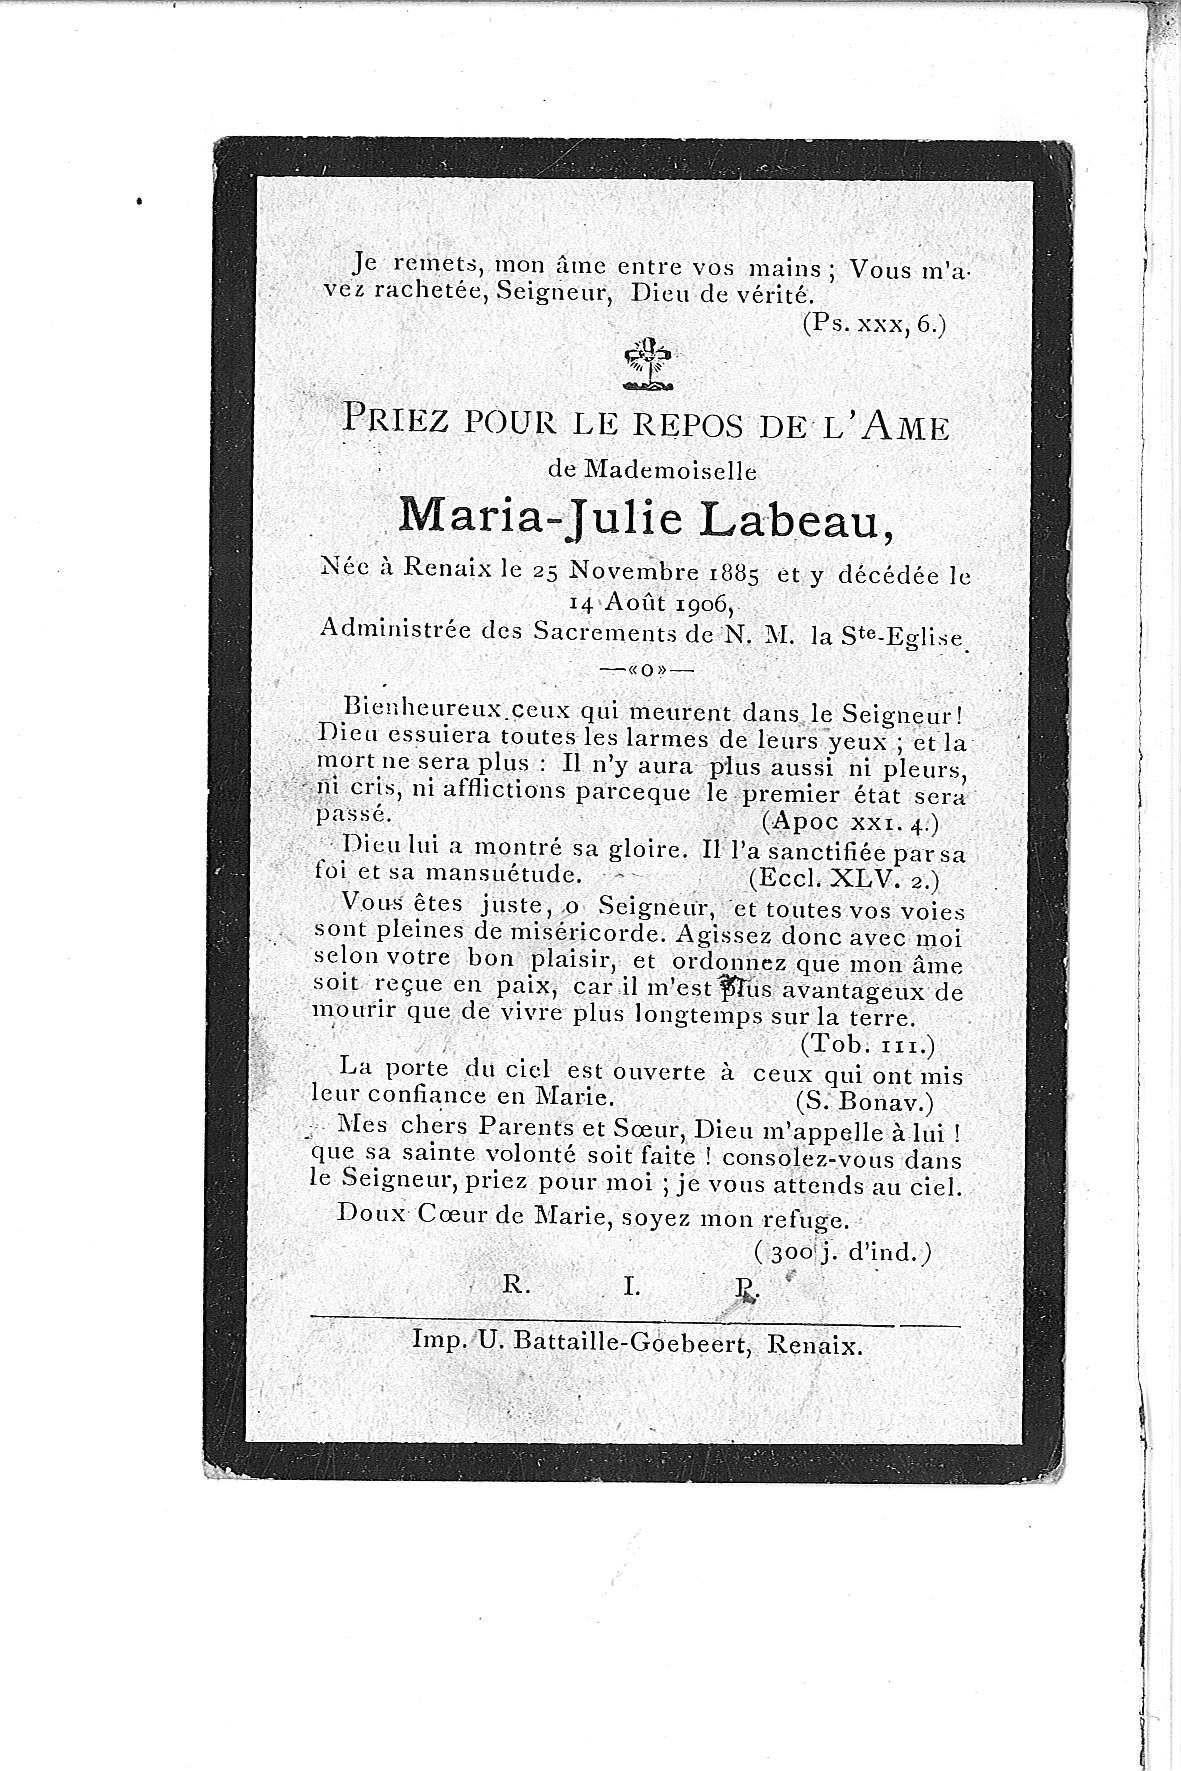 Maria-Julie(1906)20110119162717_00011.jpg